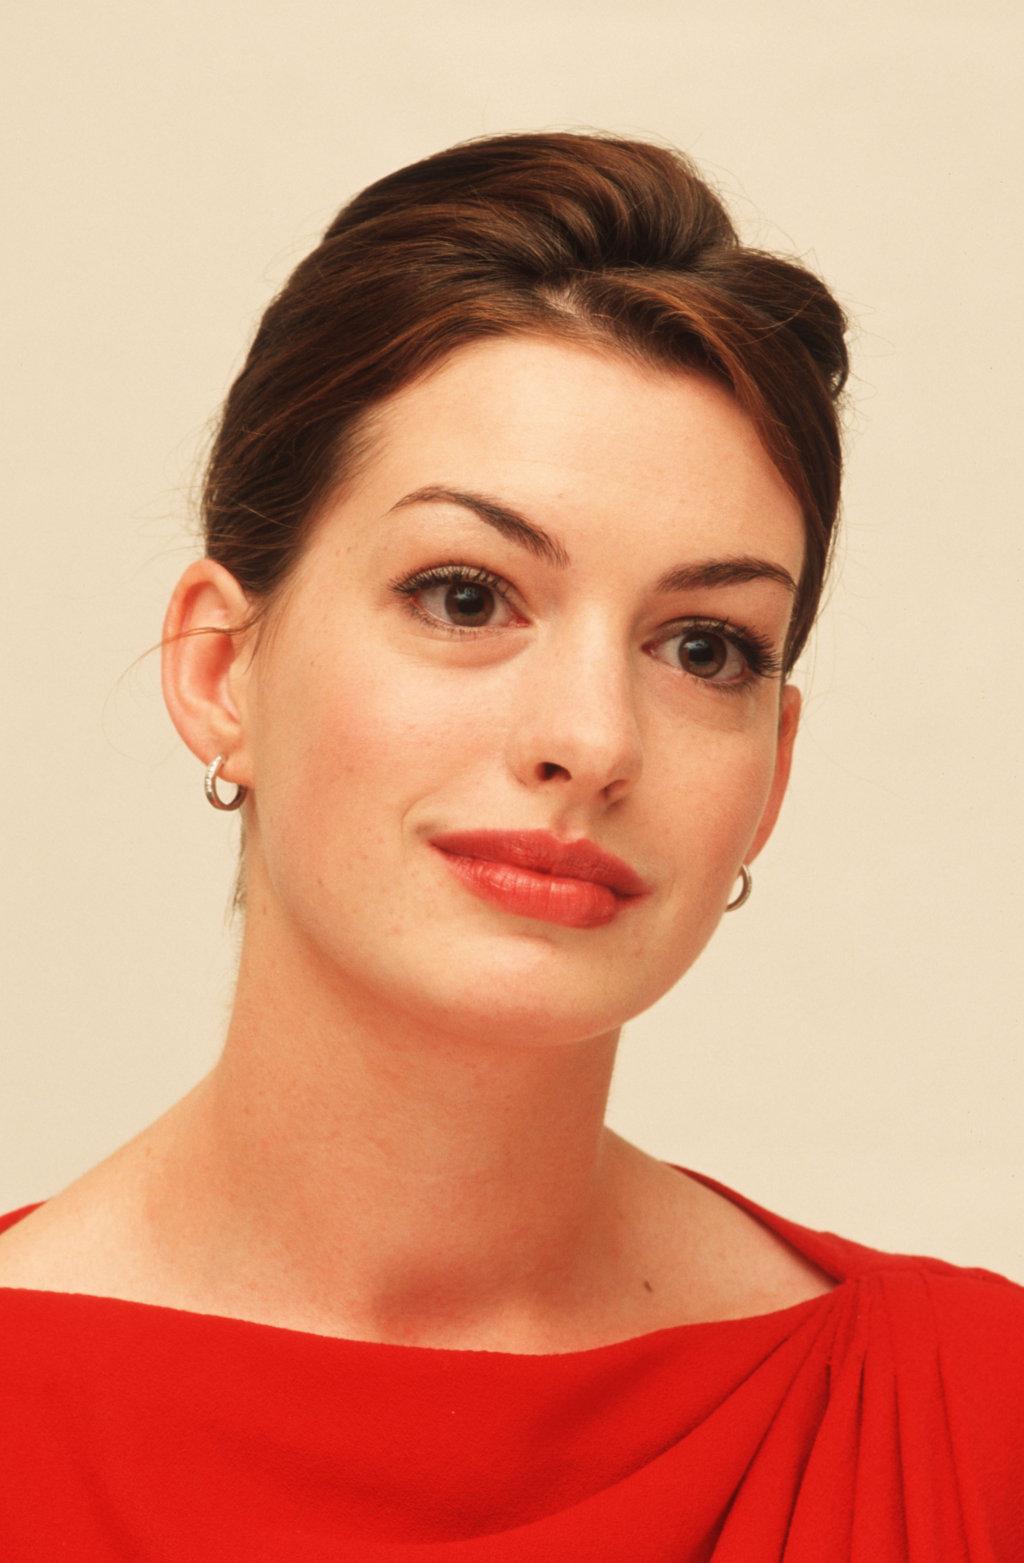 Bokep-ID » Download Galeri Anne Hathaway Profil Biodata Dan Foto ...